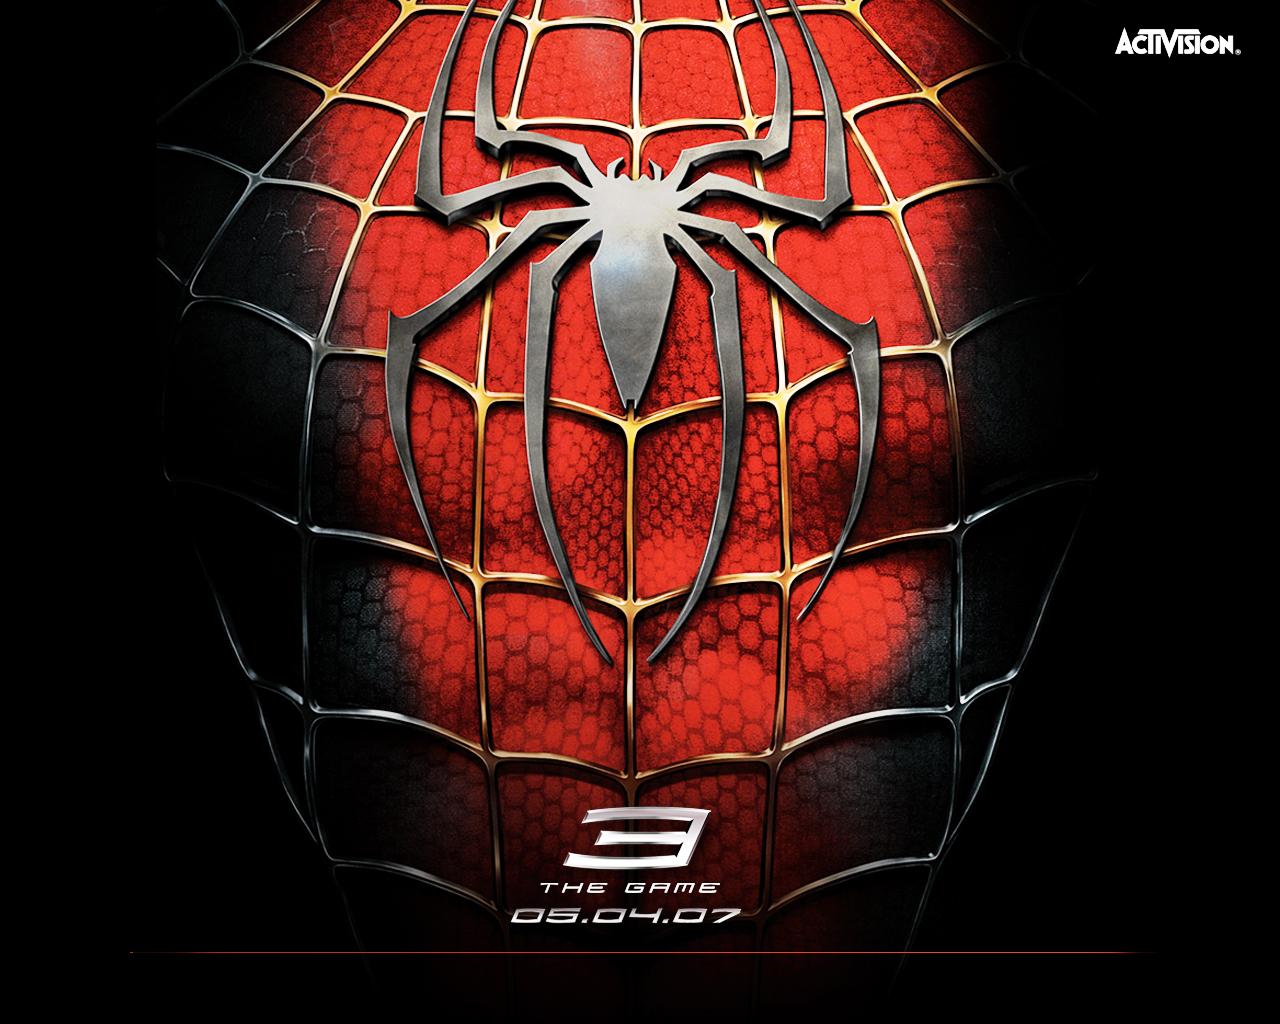 Fond ecran wallpaper Spider Man 3   JeuxVideofr 1280x1024